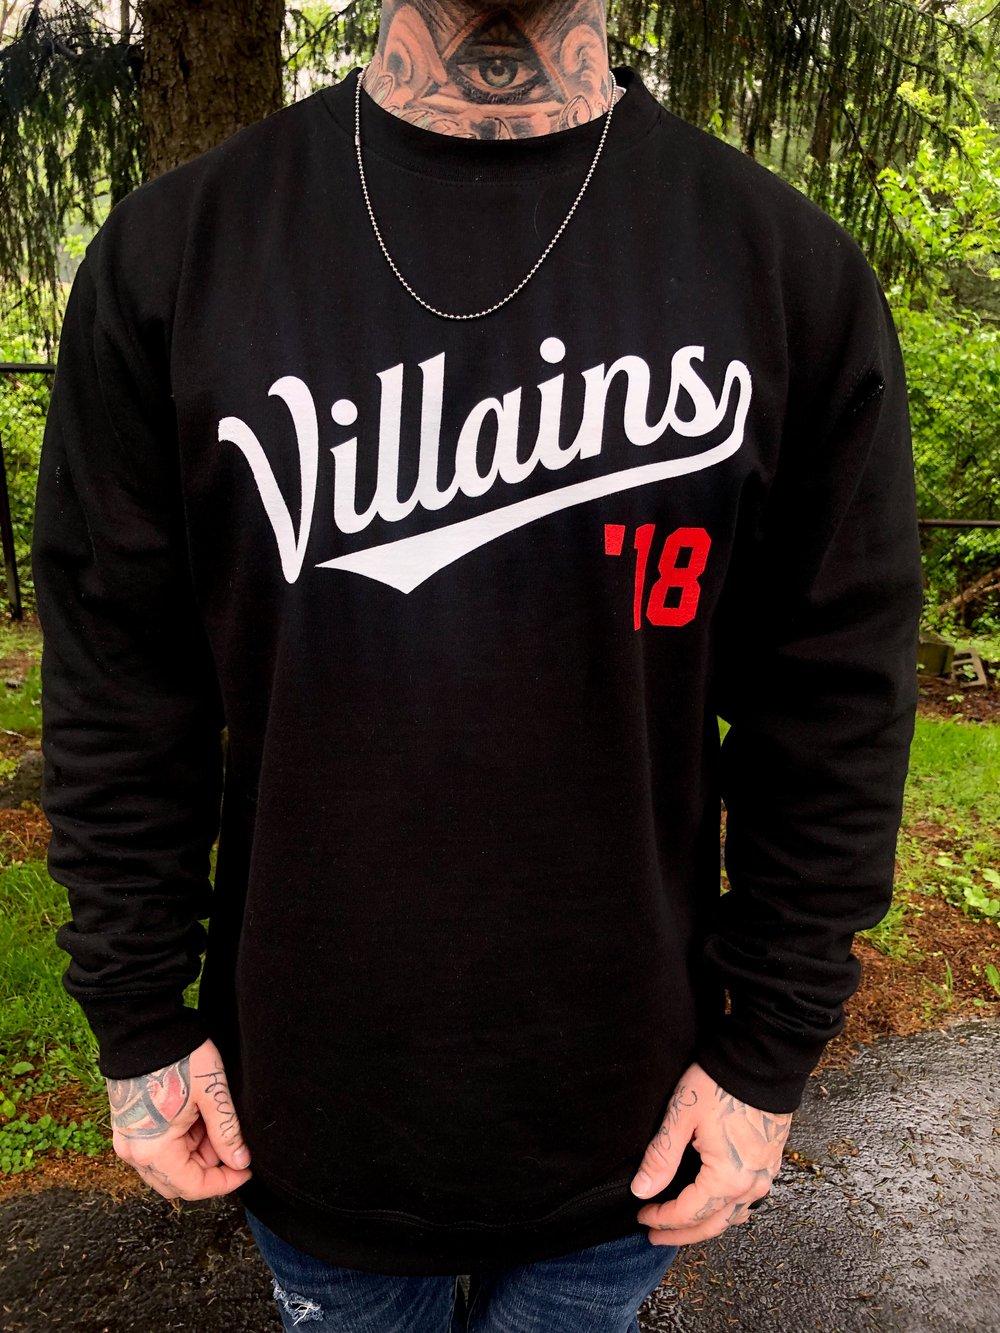 Image of Villains '18 limited edition Crewneck sweatshirt